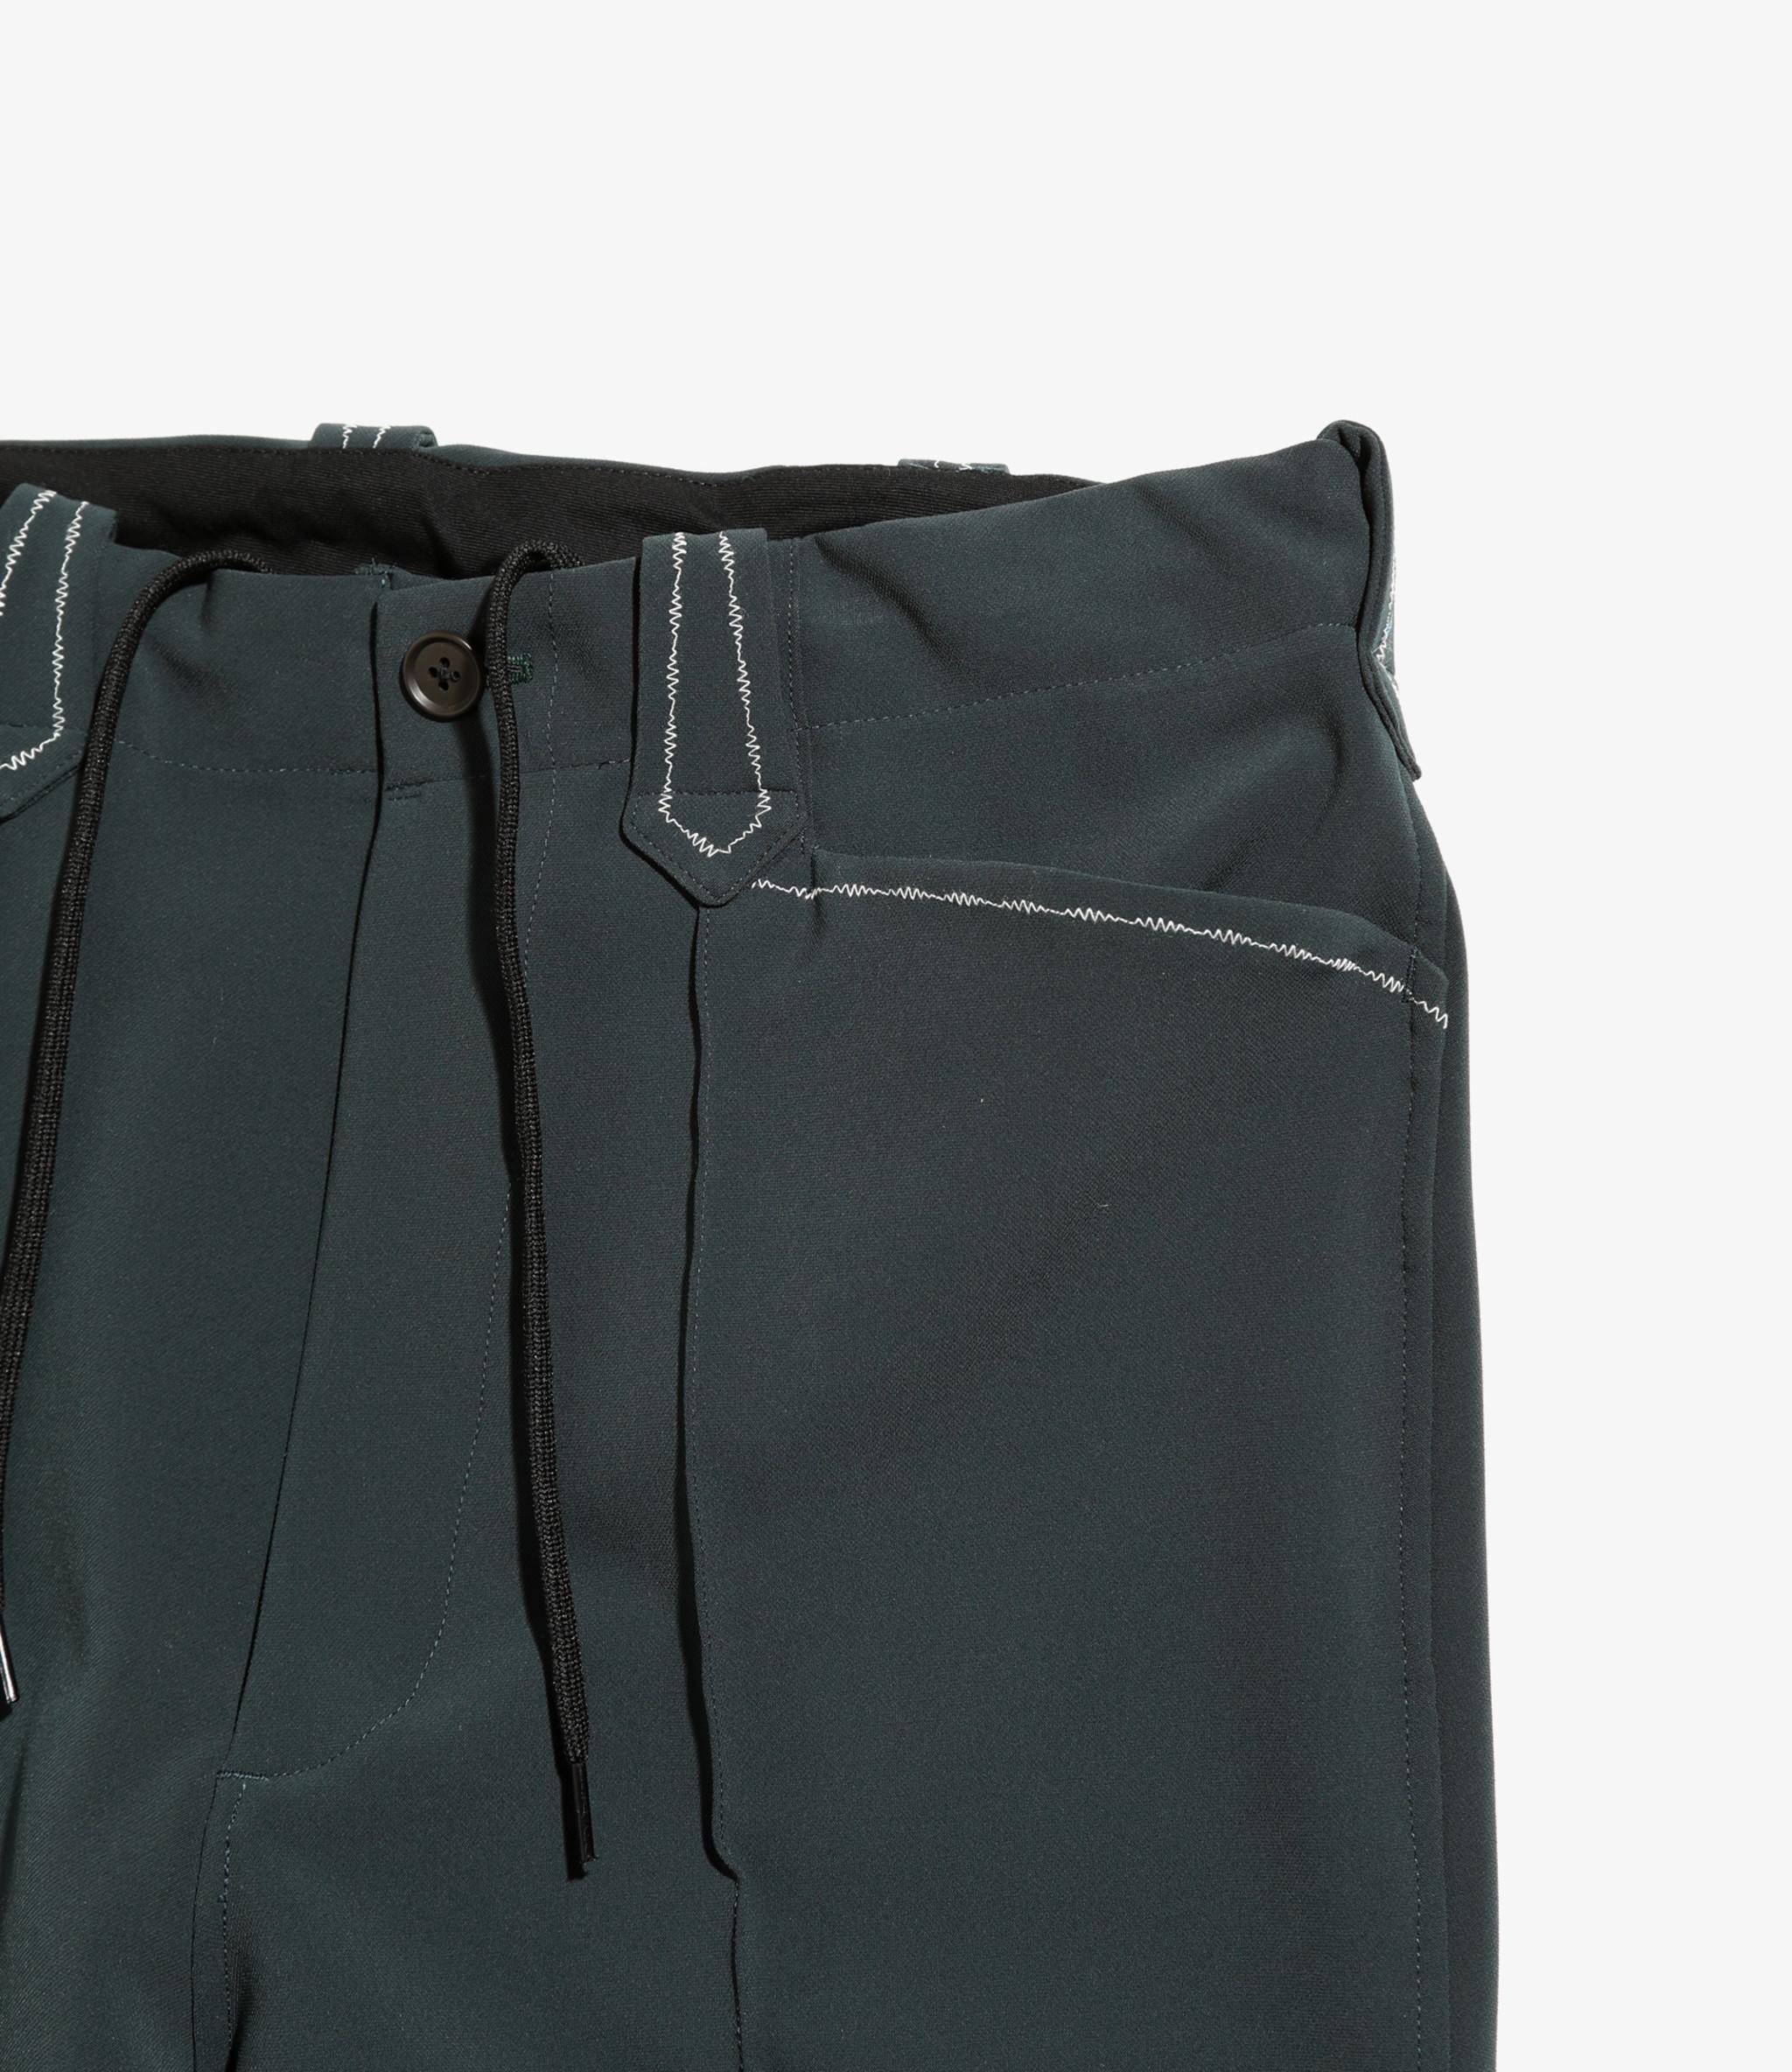 Needles Western Leisure Pant - Pe/Pu Double Cloth - Green